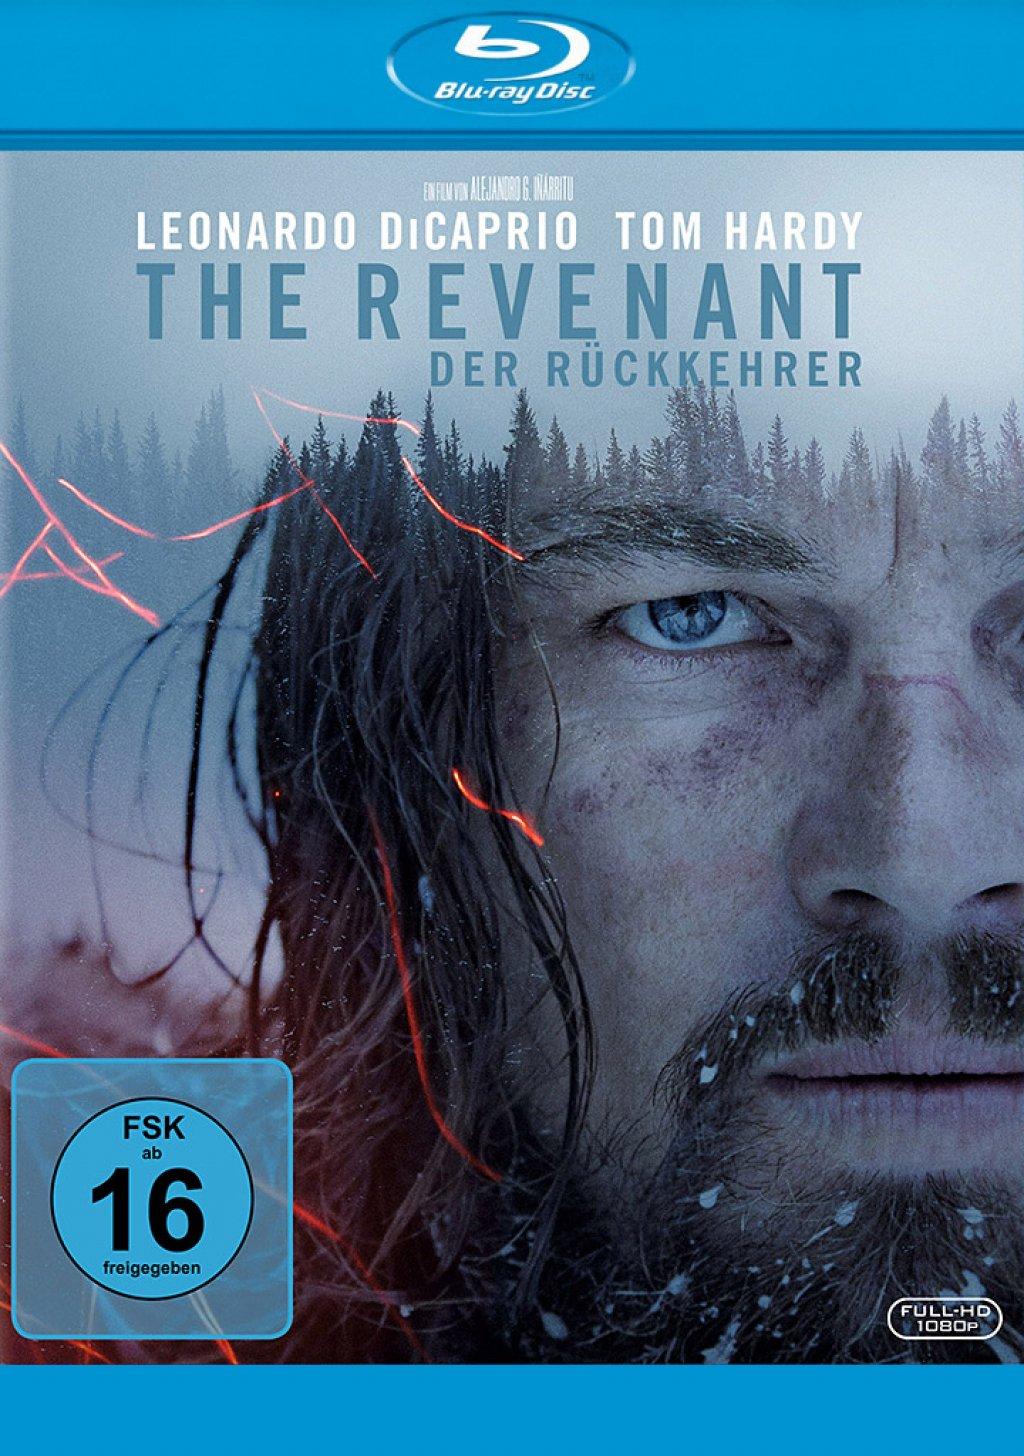 The Revenant - Der Rückkehrer (Blu-ray)